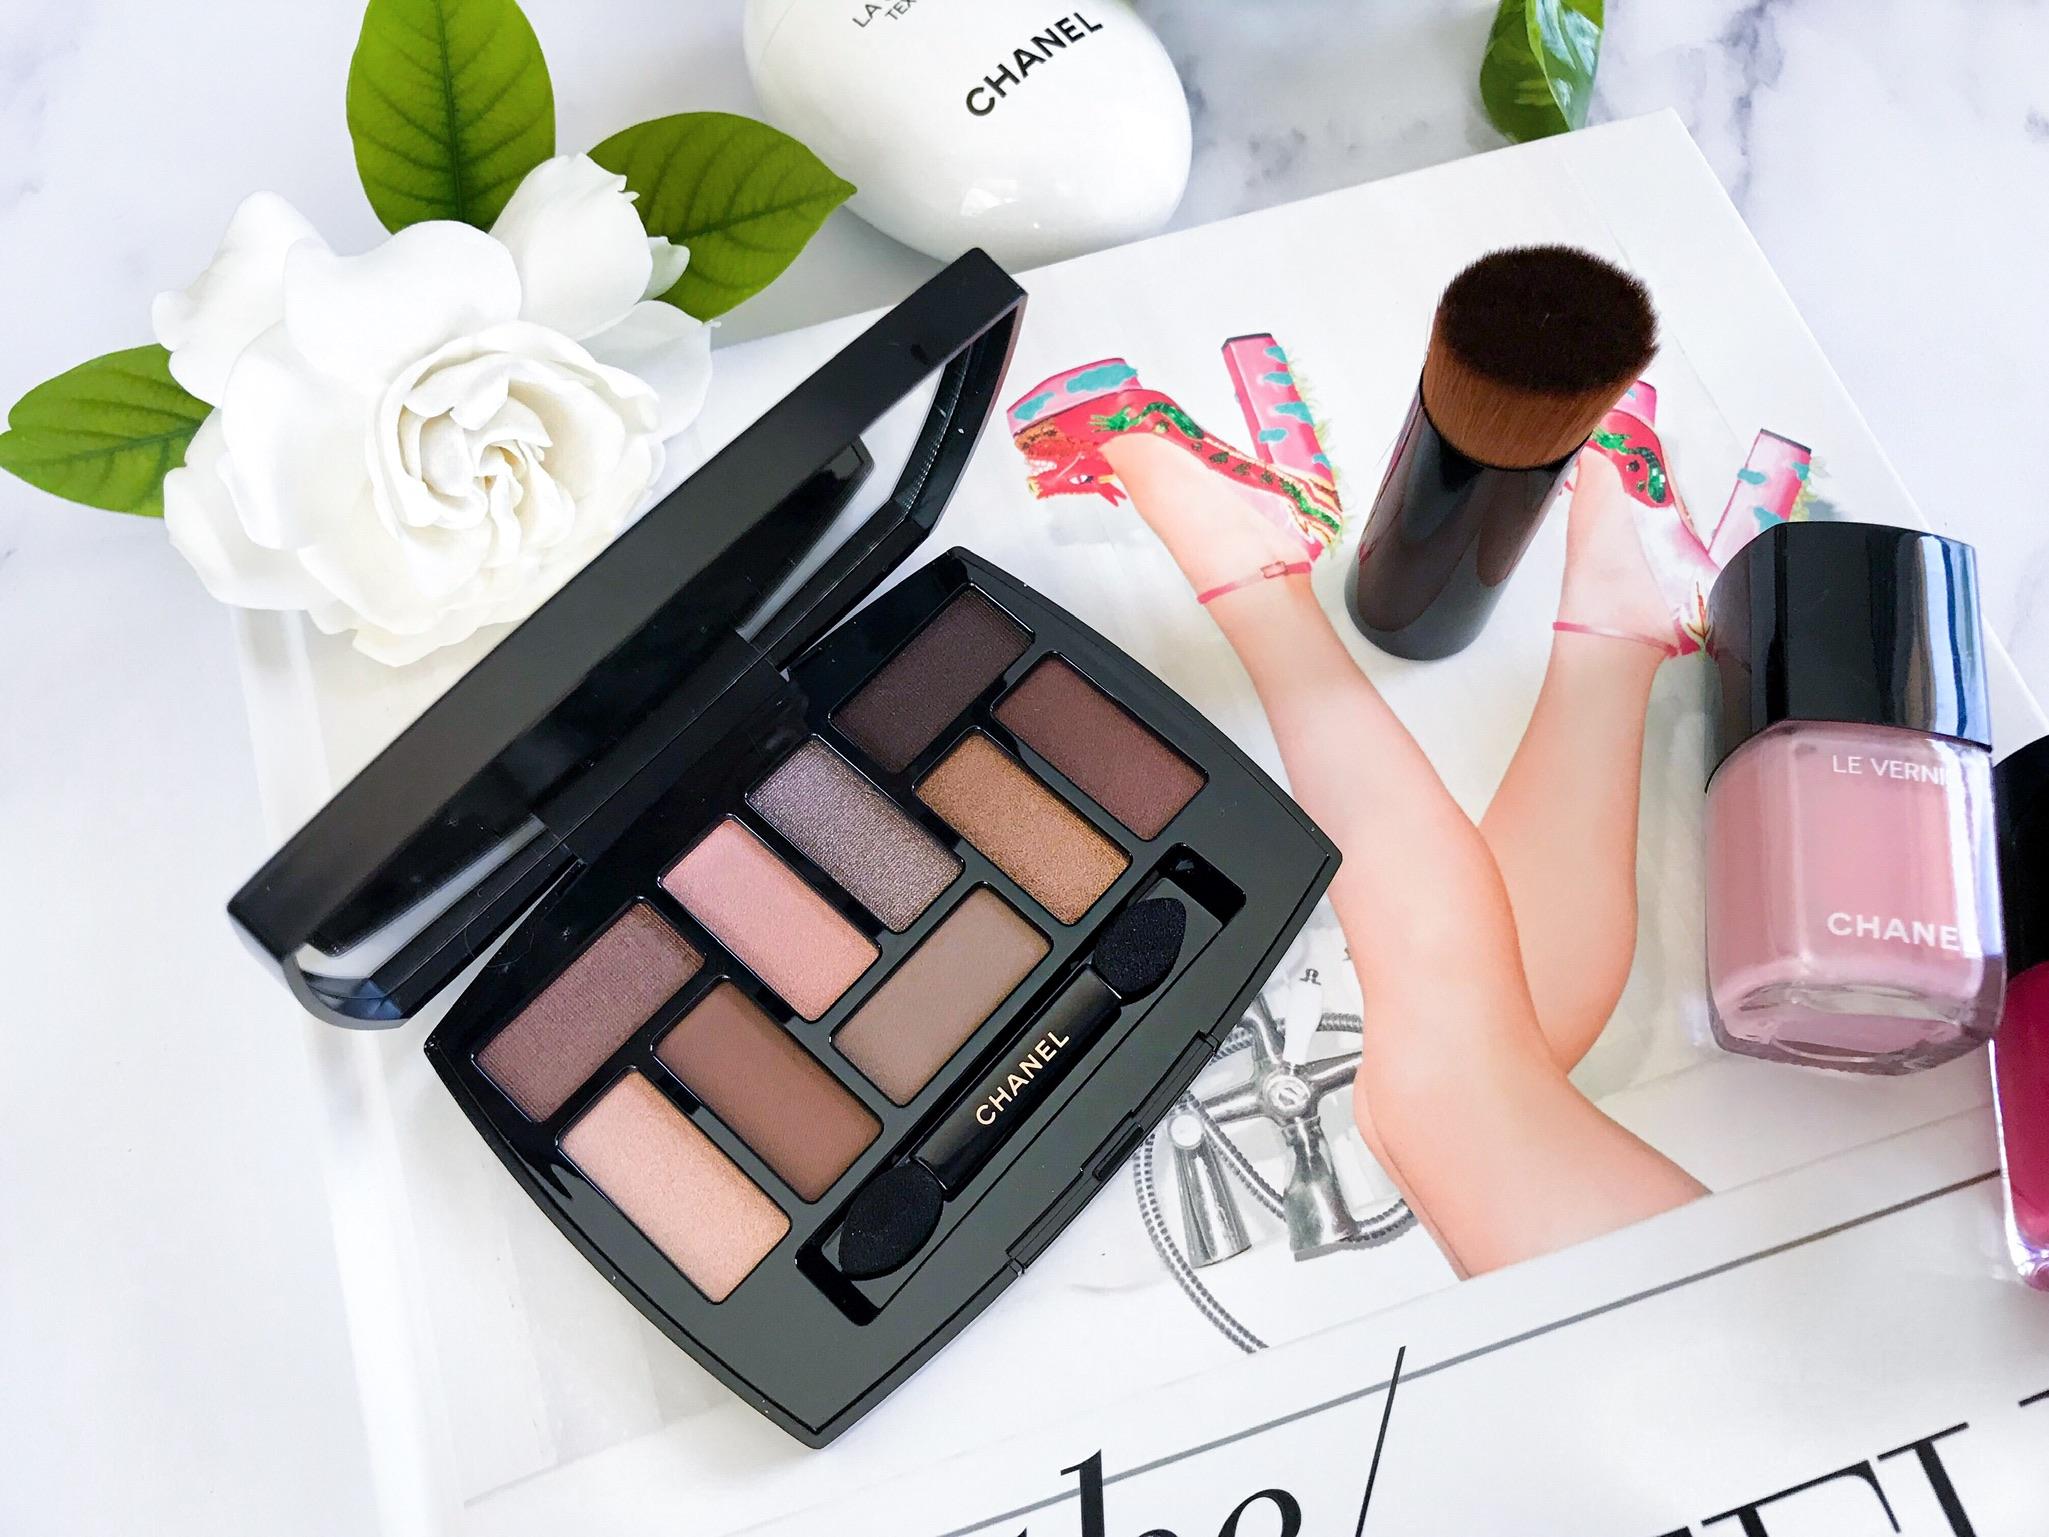 c2a3d74e2a The NEW Chanel Les Beiges Natural Eyeshadow Palette Les ...